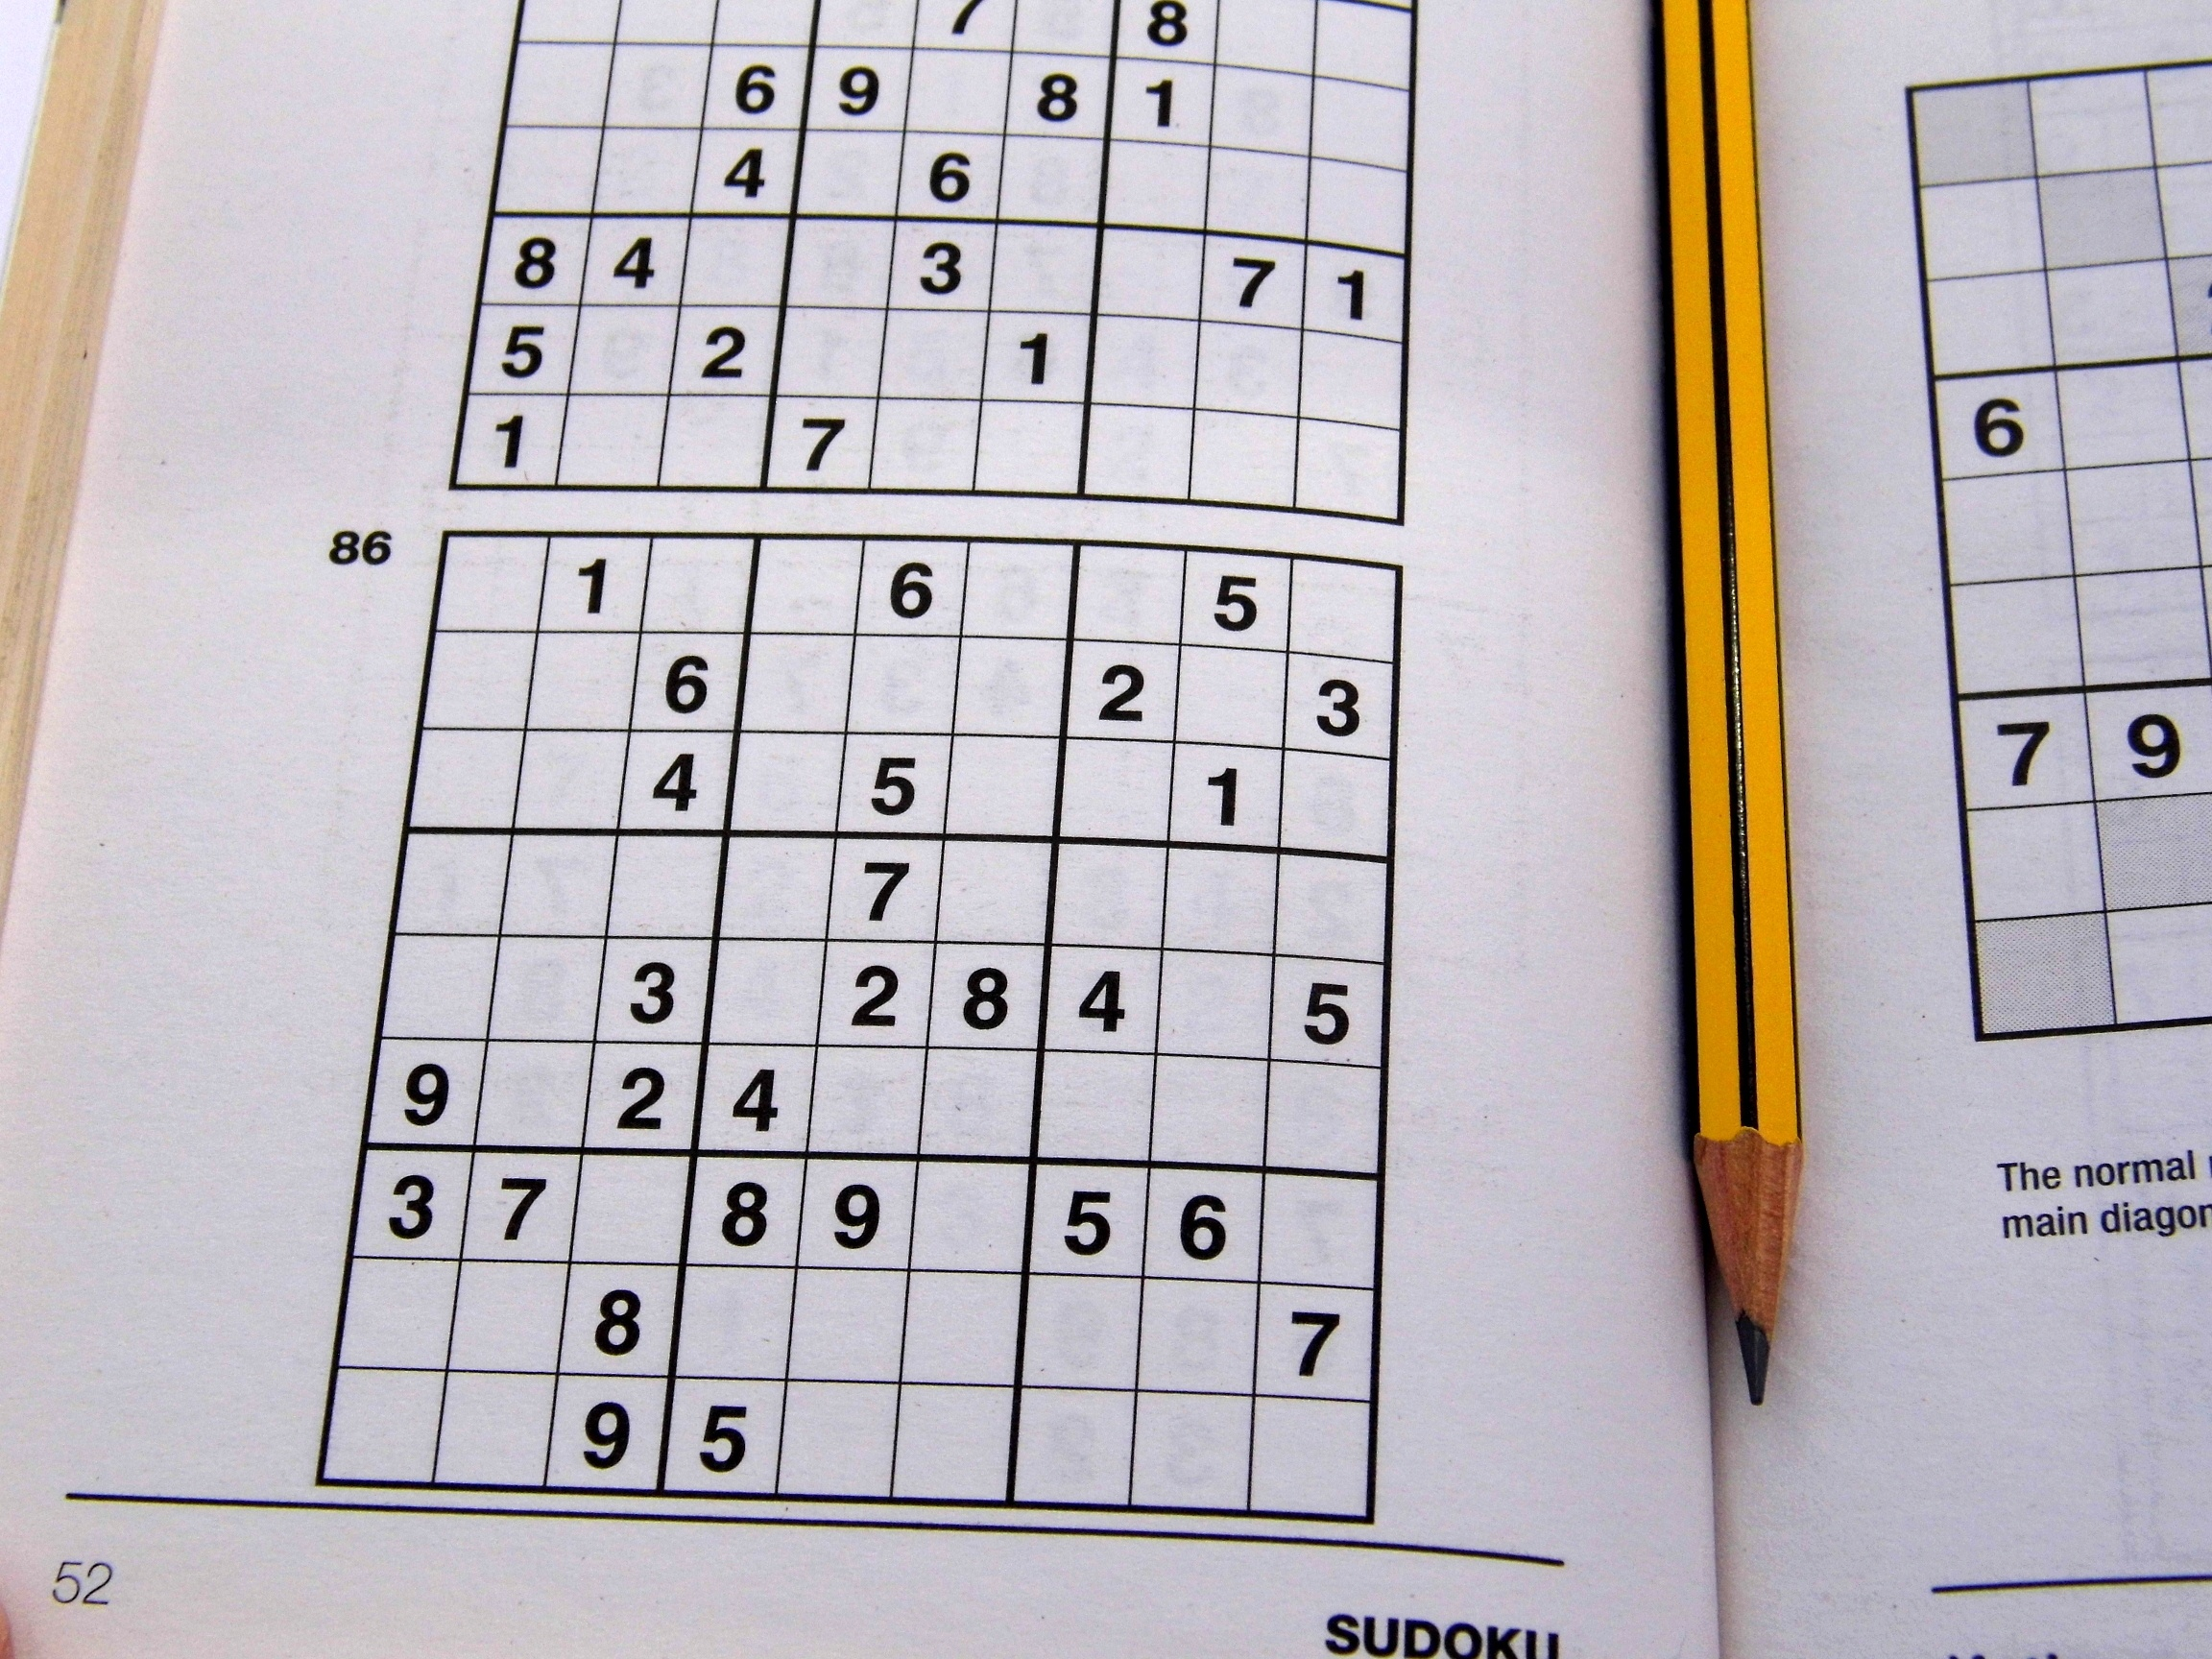 Easy Printable Sudoku Puzzles 6 Per Page – Book 2 – Free Sudoku Puzzles - Free Printable Sudoku Books